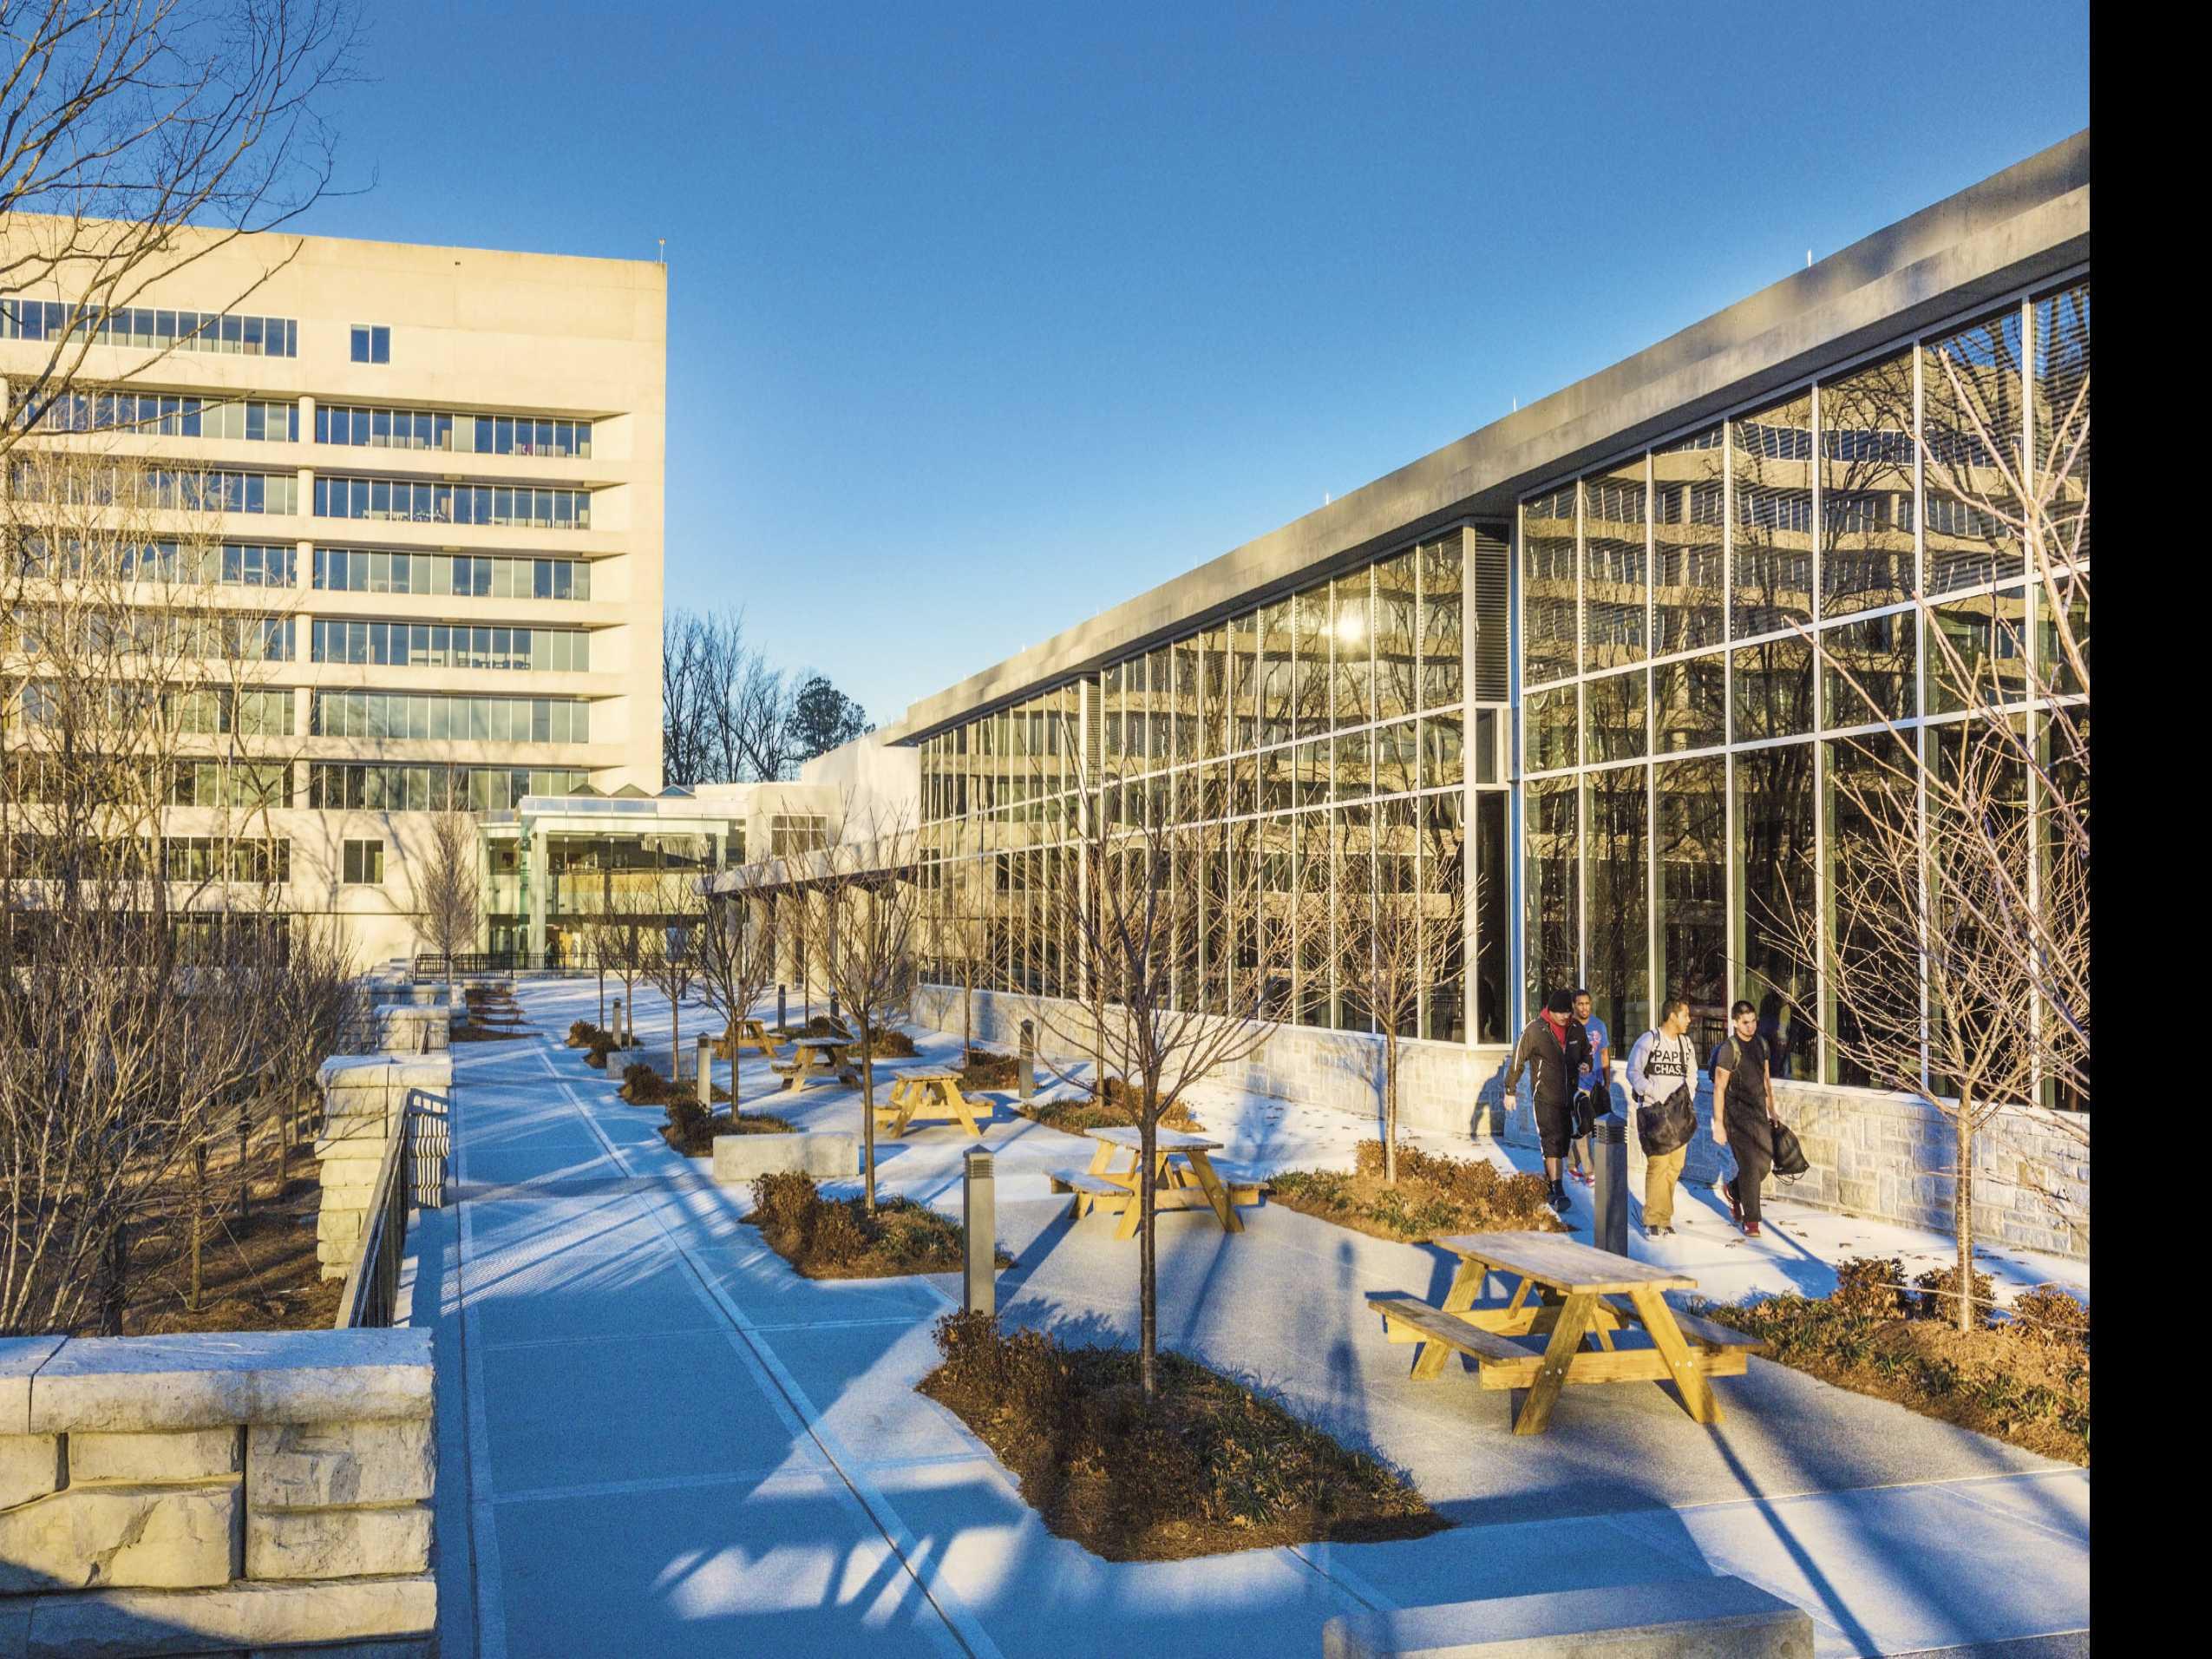 Vacant Office Parks Repurposed as School, College Buildings